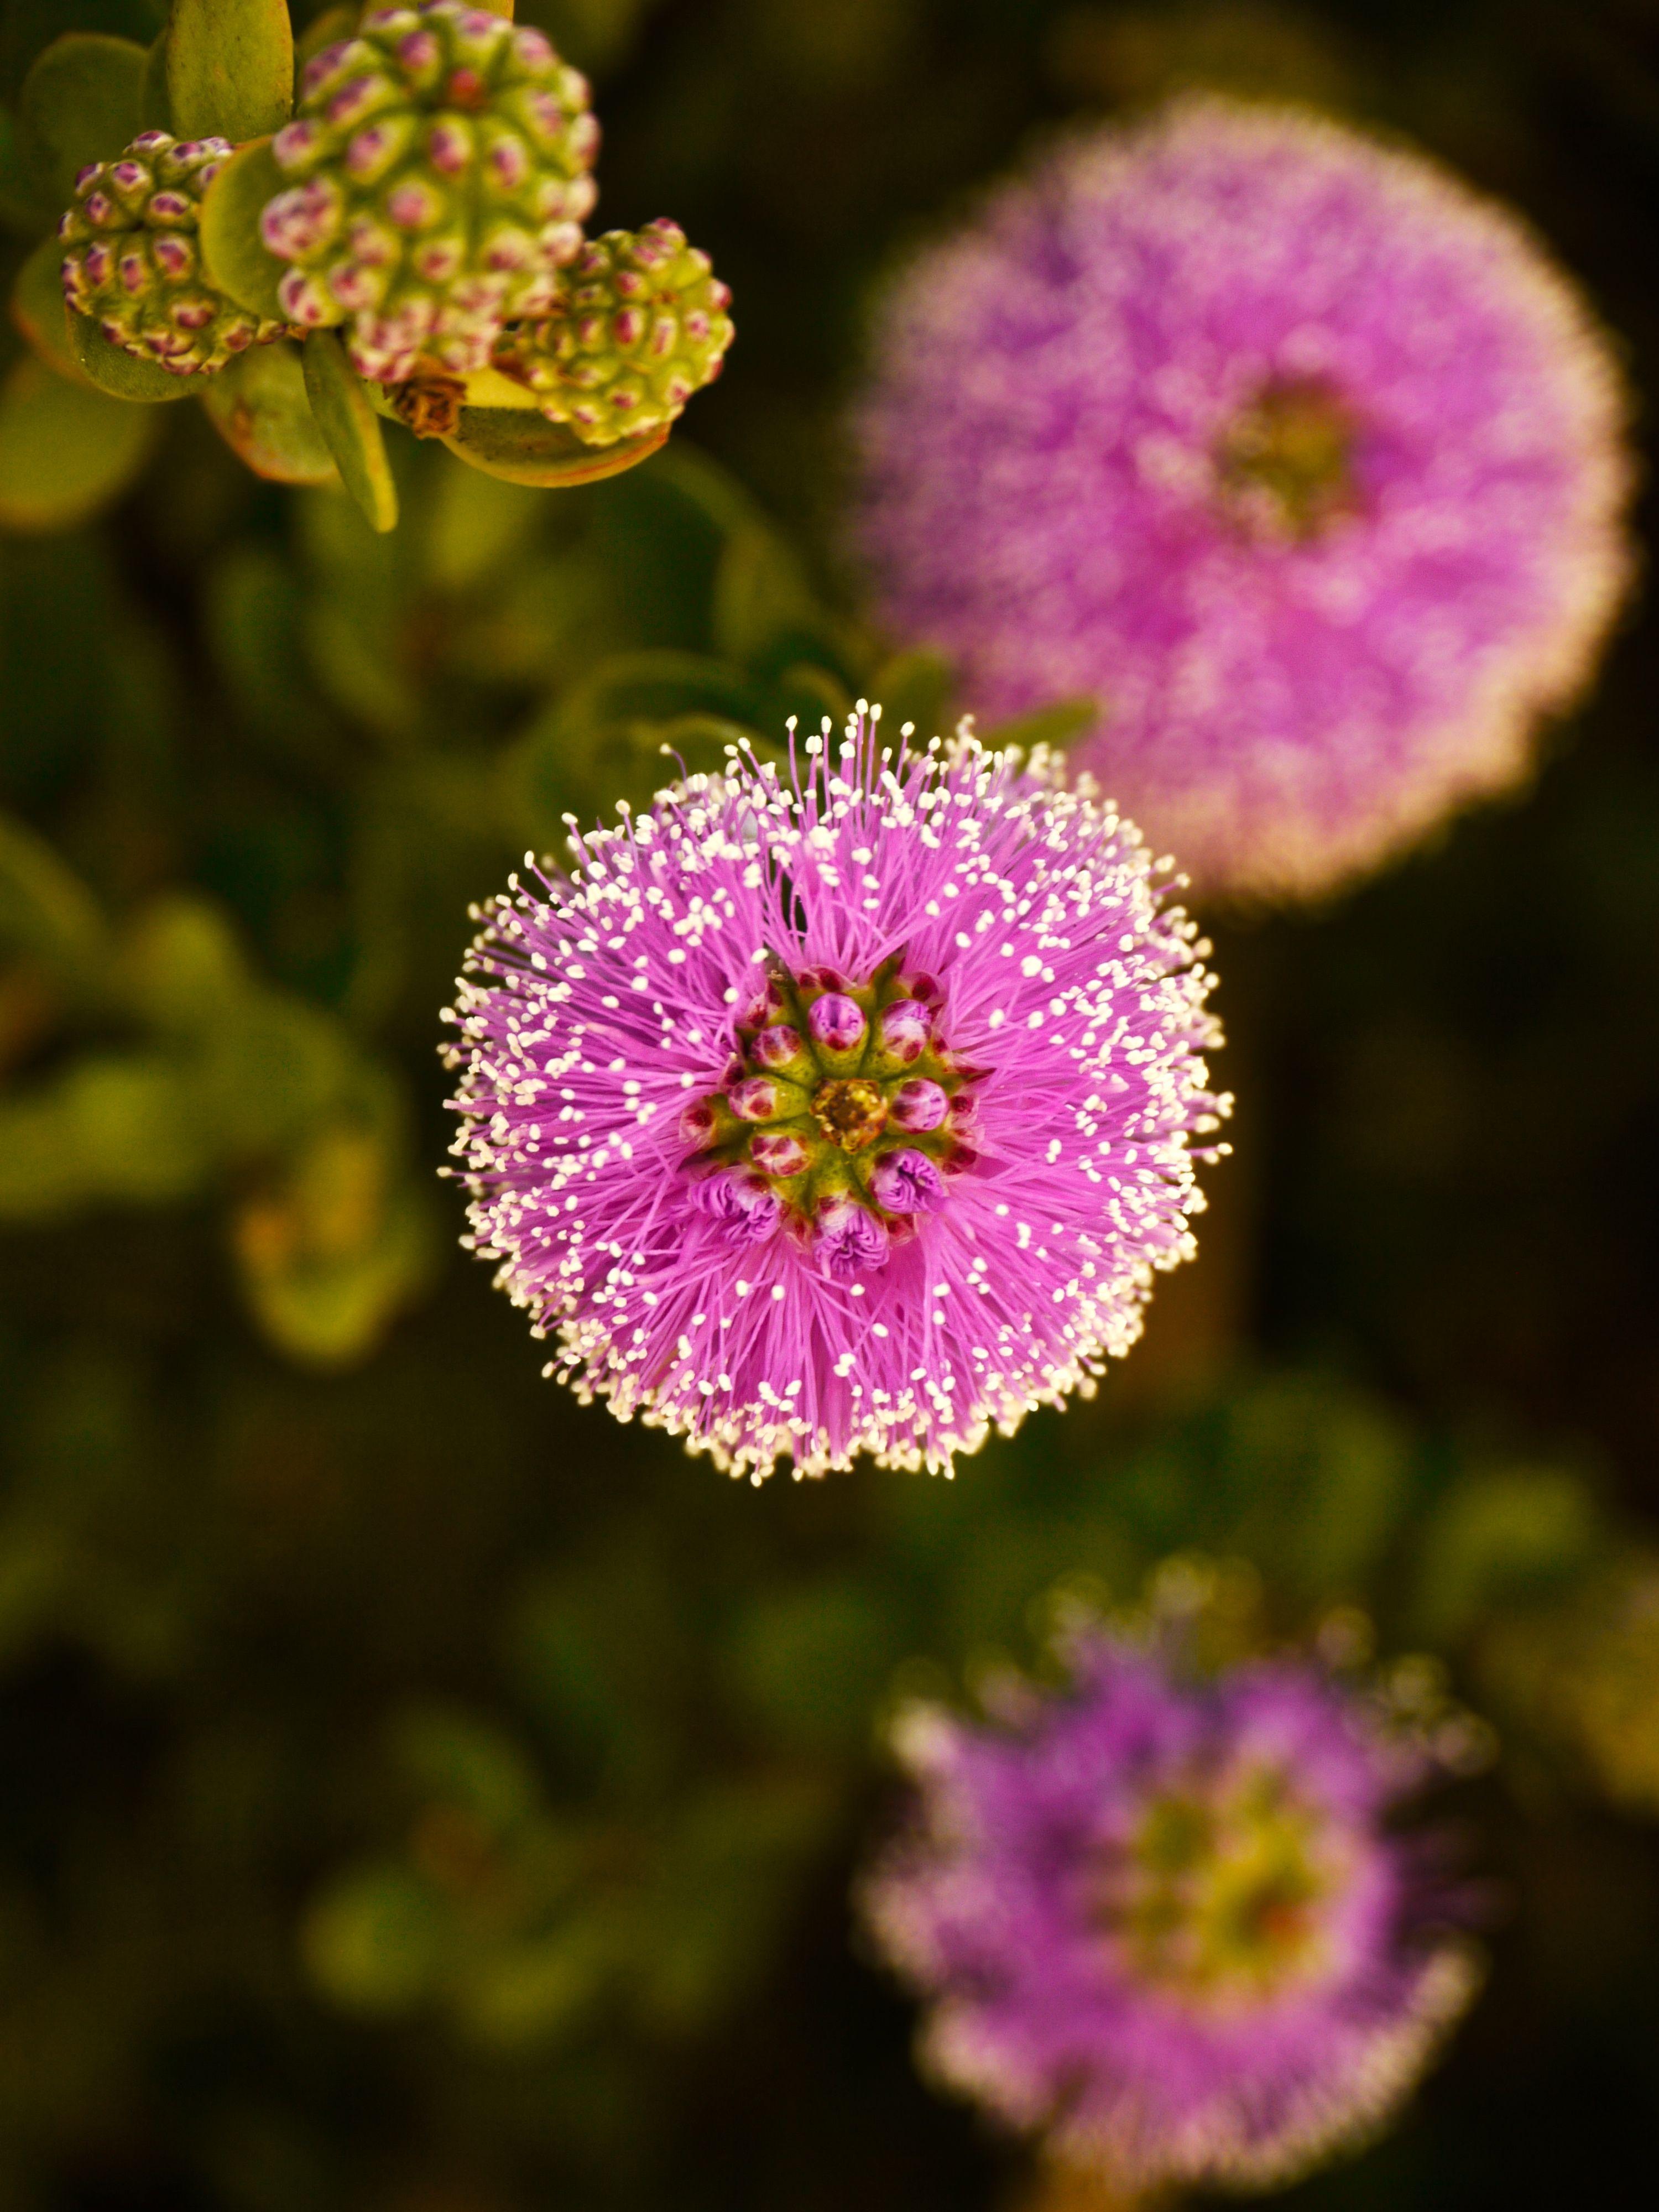 Fibre optic christmas flowers and xmas flowers - Fiber Optic Flowers Google Search